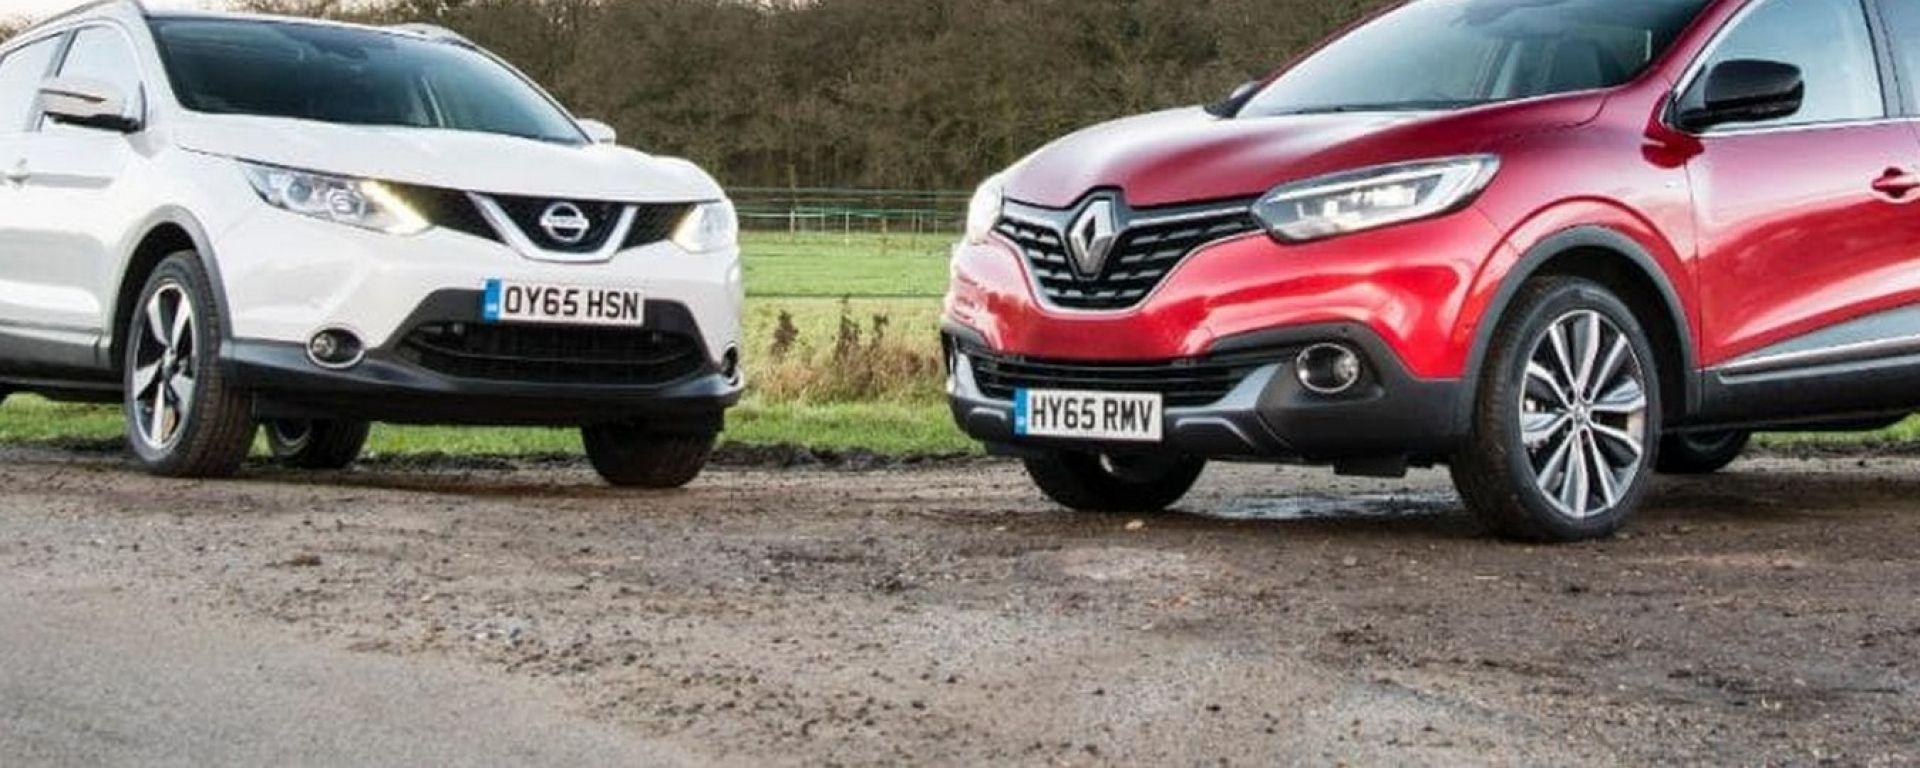 Alleanza Renault Nissan, si va avanti anche senza Carlos Ghosn